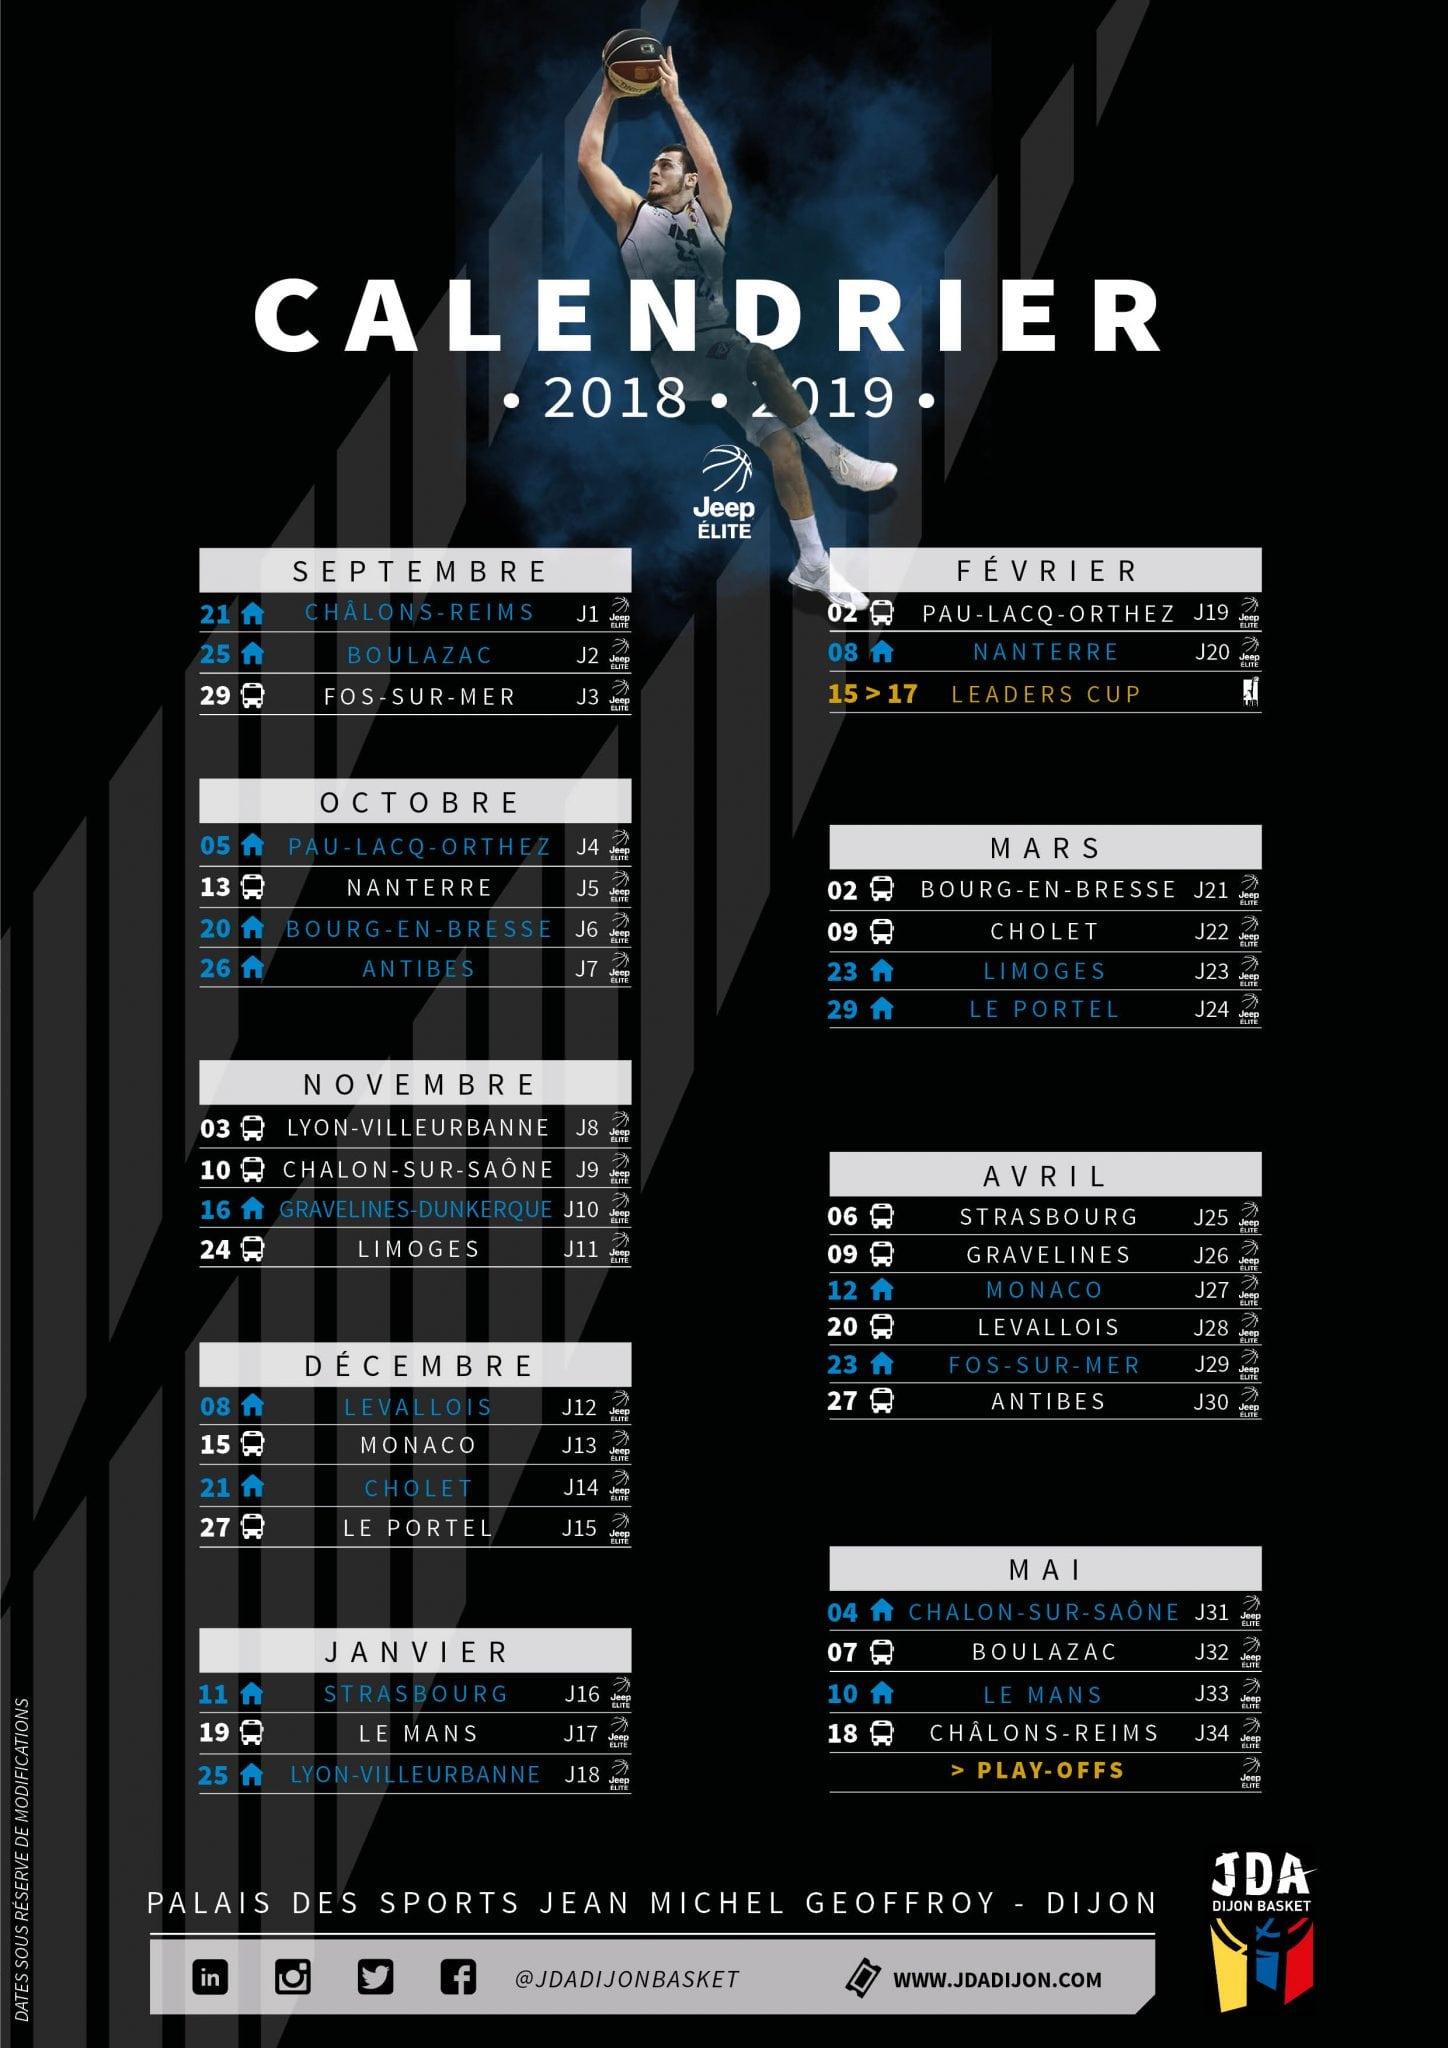 calendrier-jeep 2018/2019